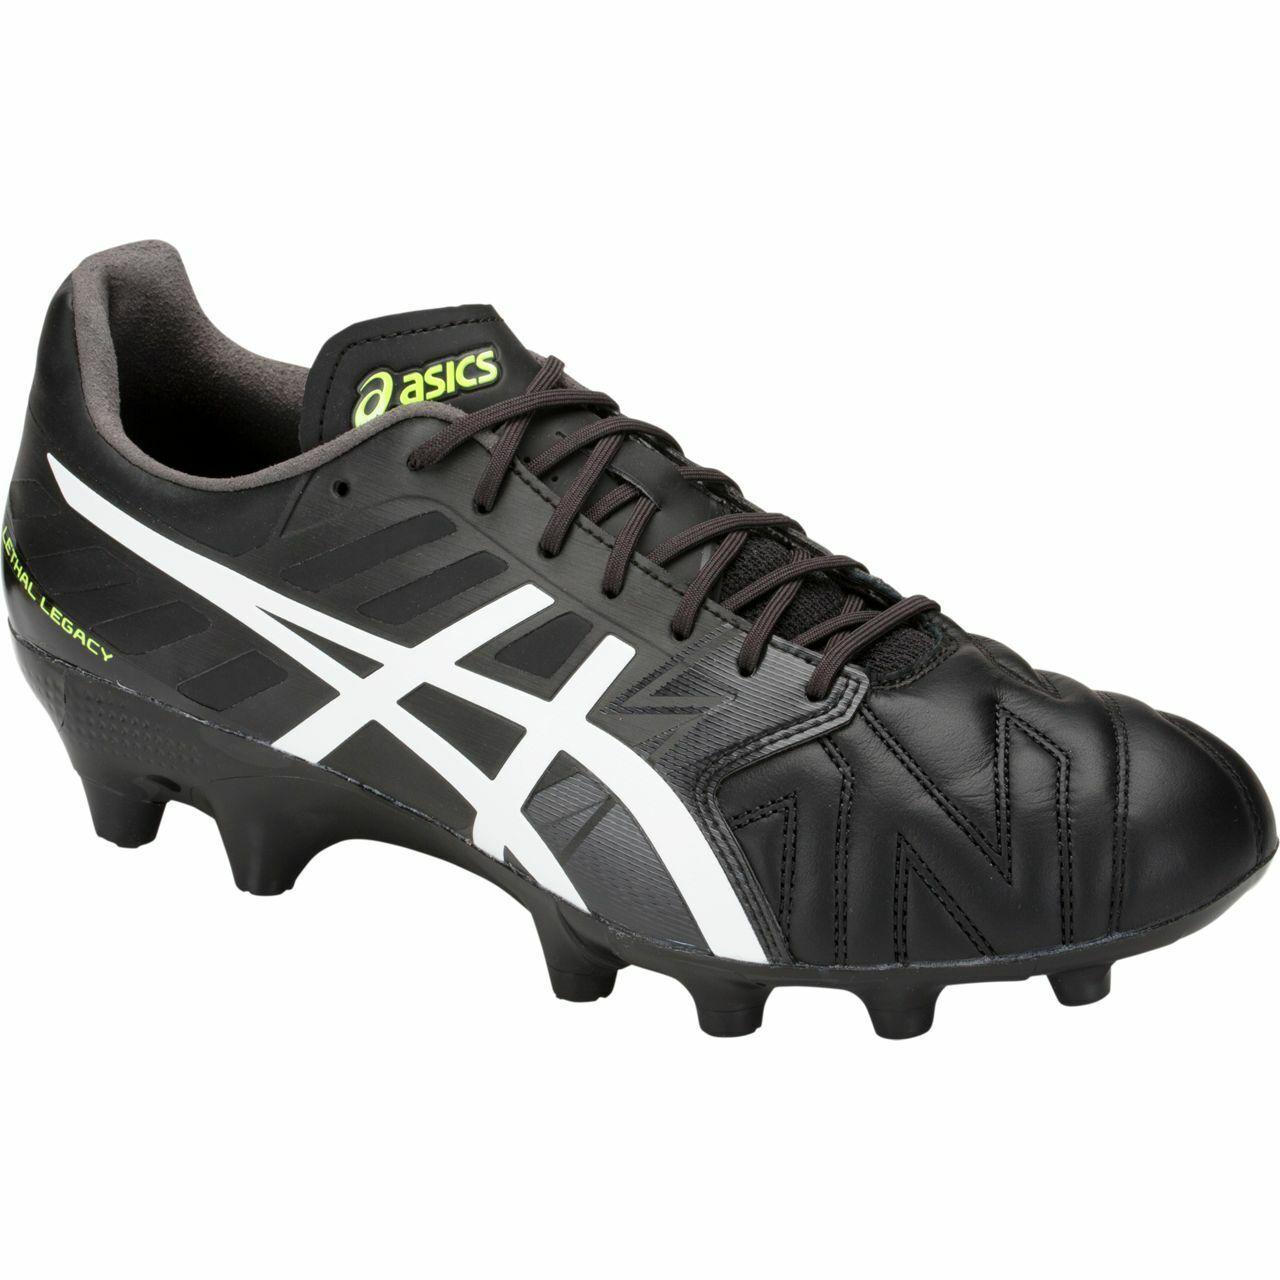 Auténtico    Asics Lethal Legacy botas de fútbol para hombre IT (001)